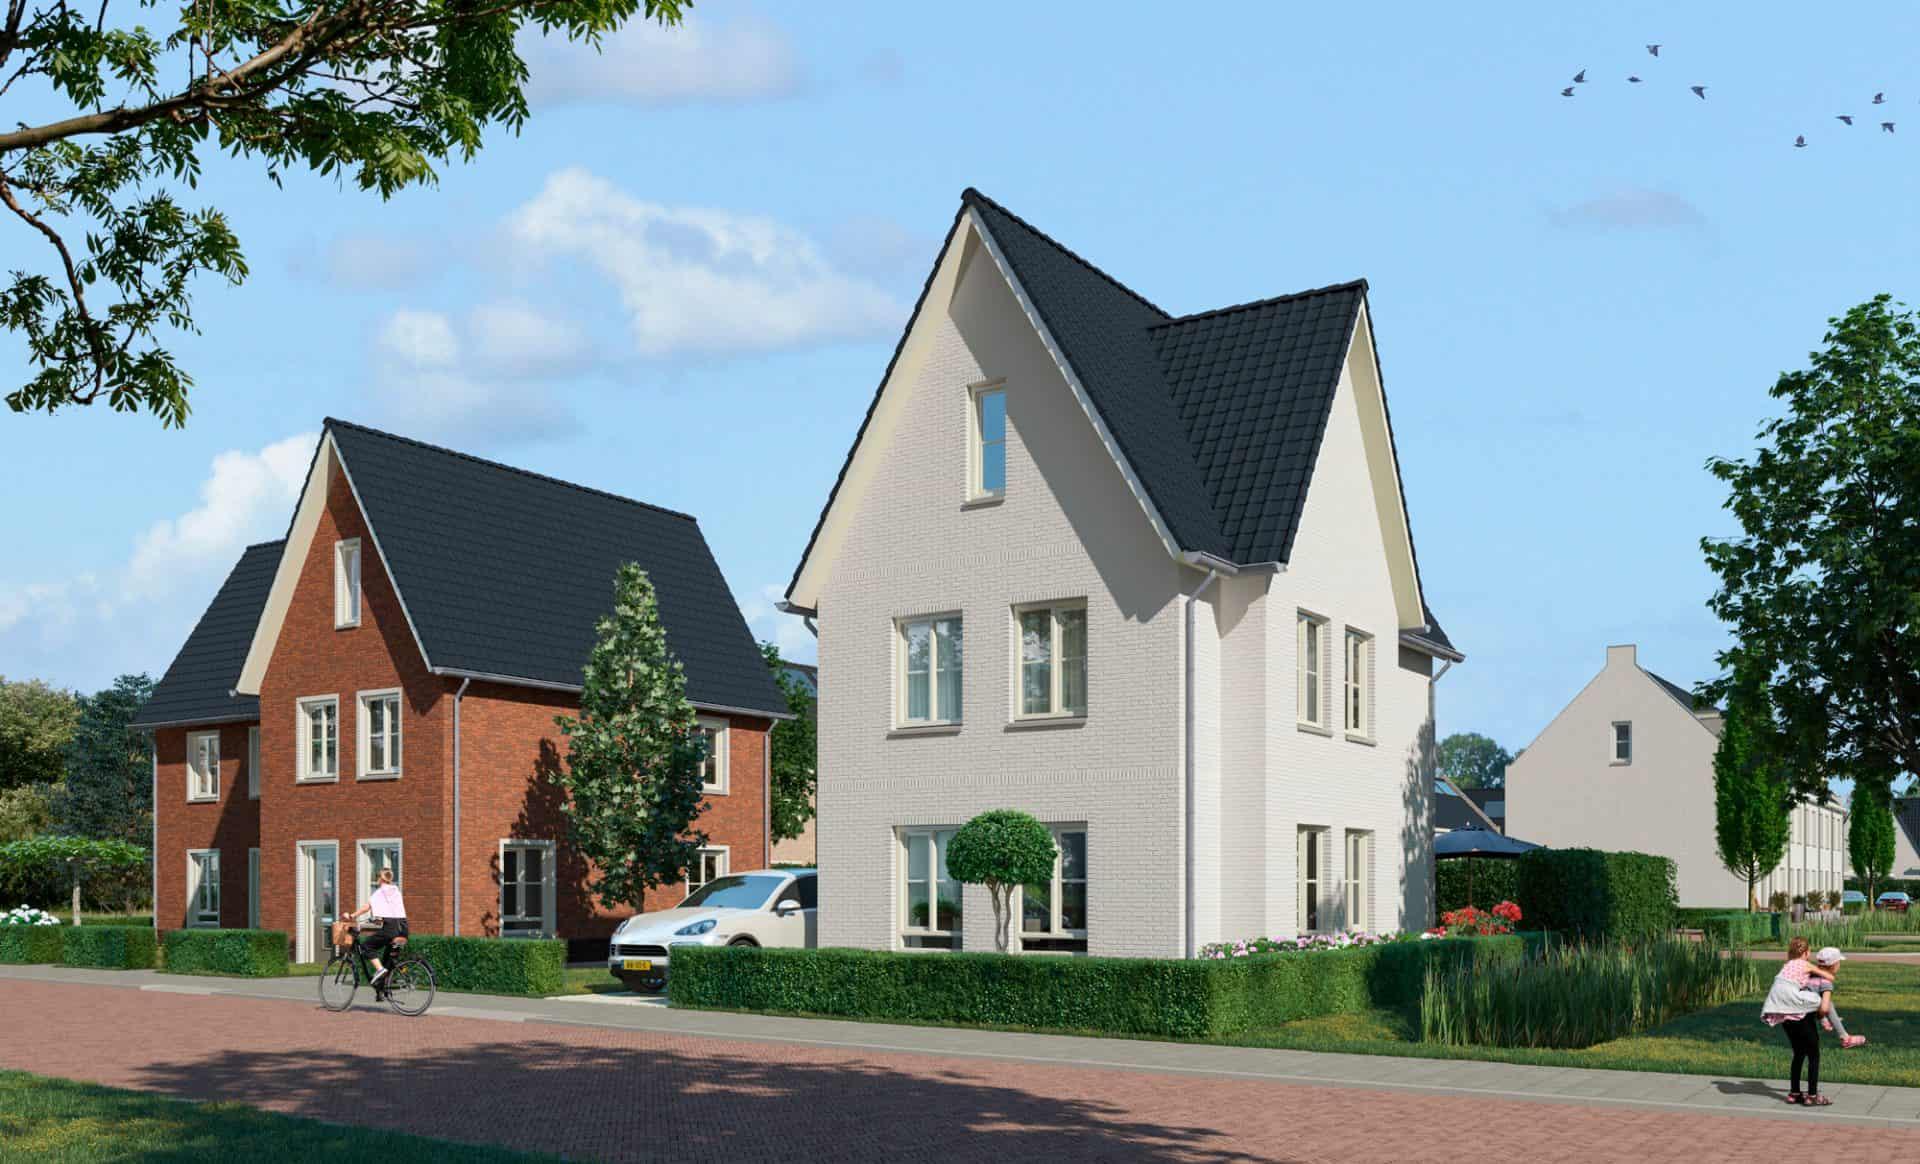 49 woningen Zuiderloo fase 2b ´De Linde Zuid´